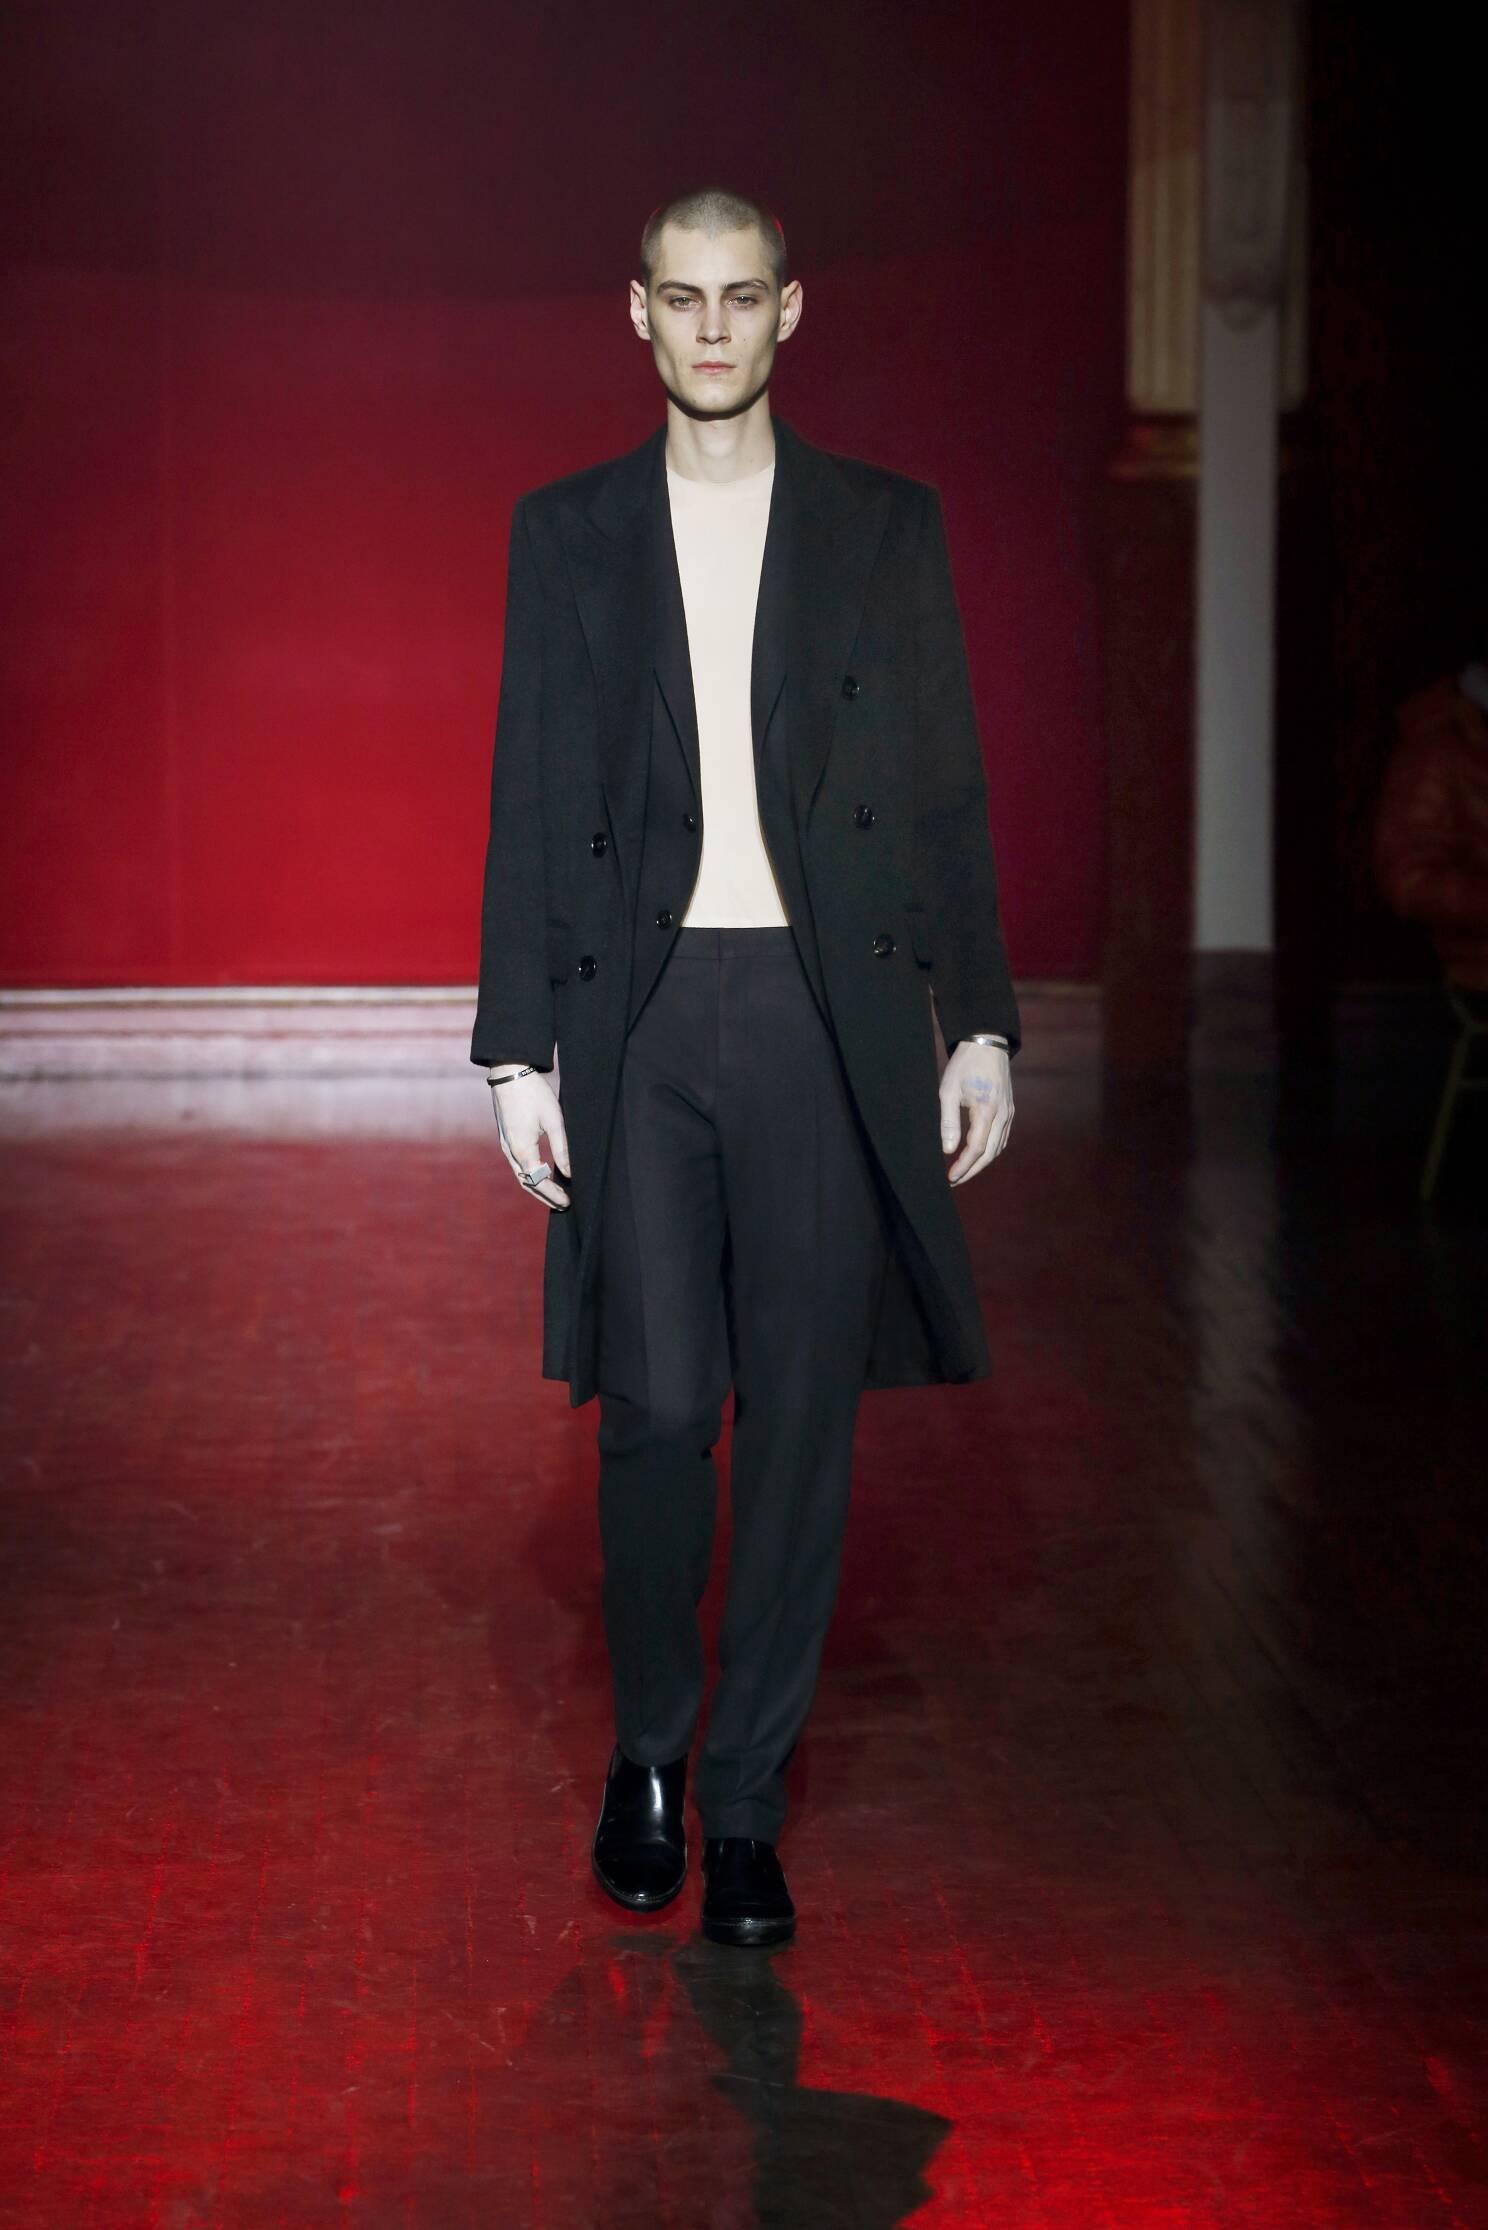 Fashion Model Maison Margiela Collection Catwalk